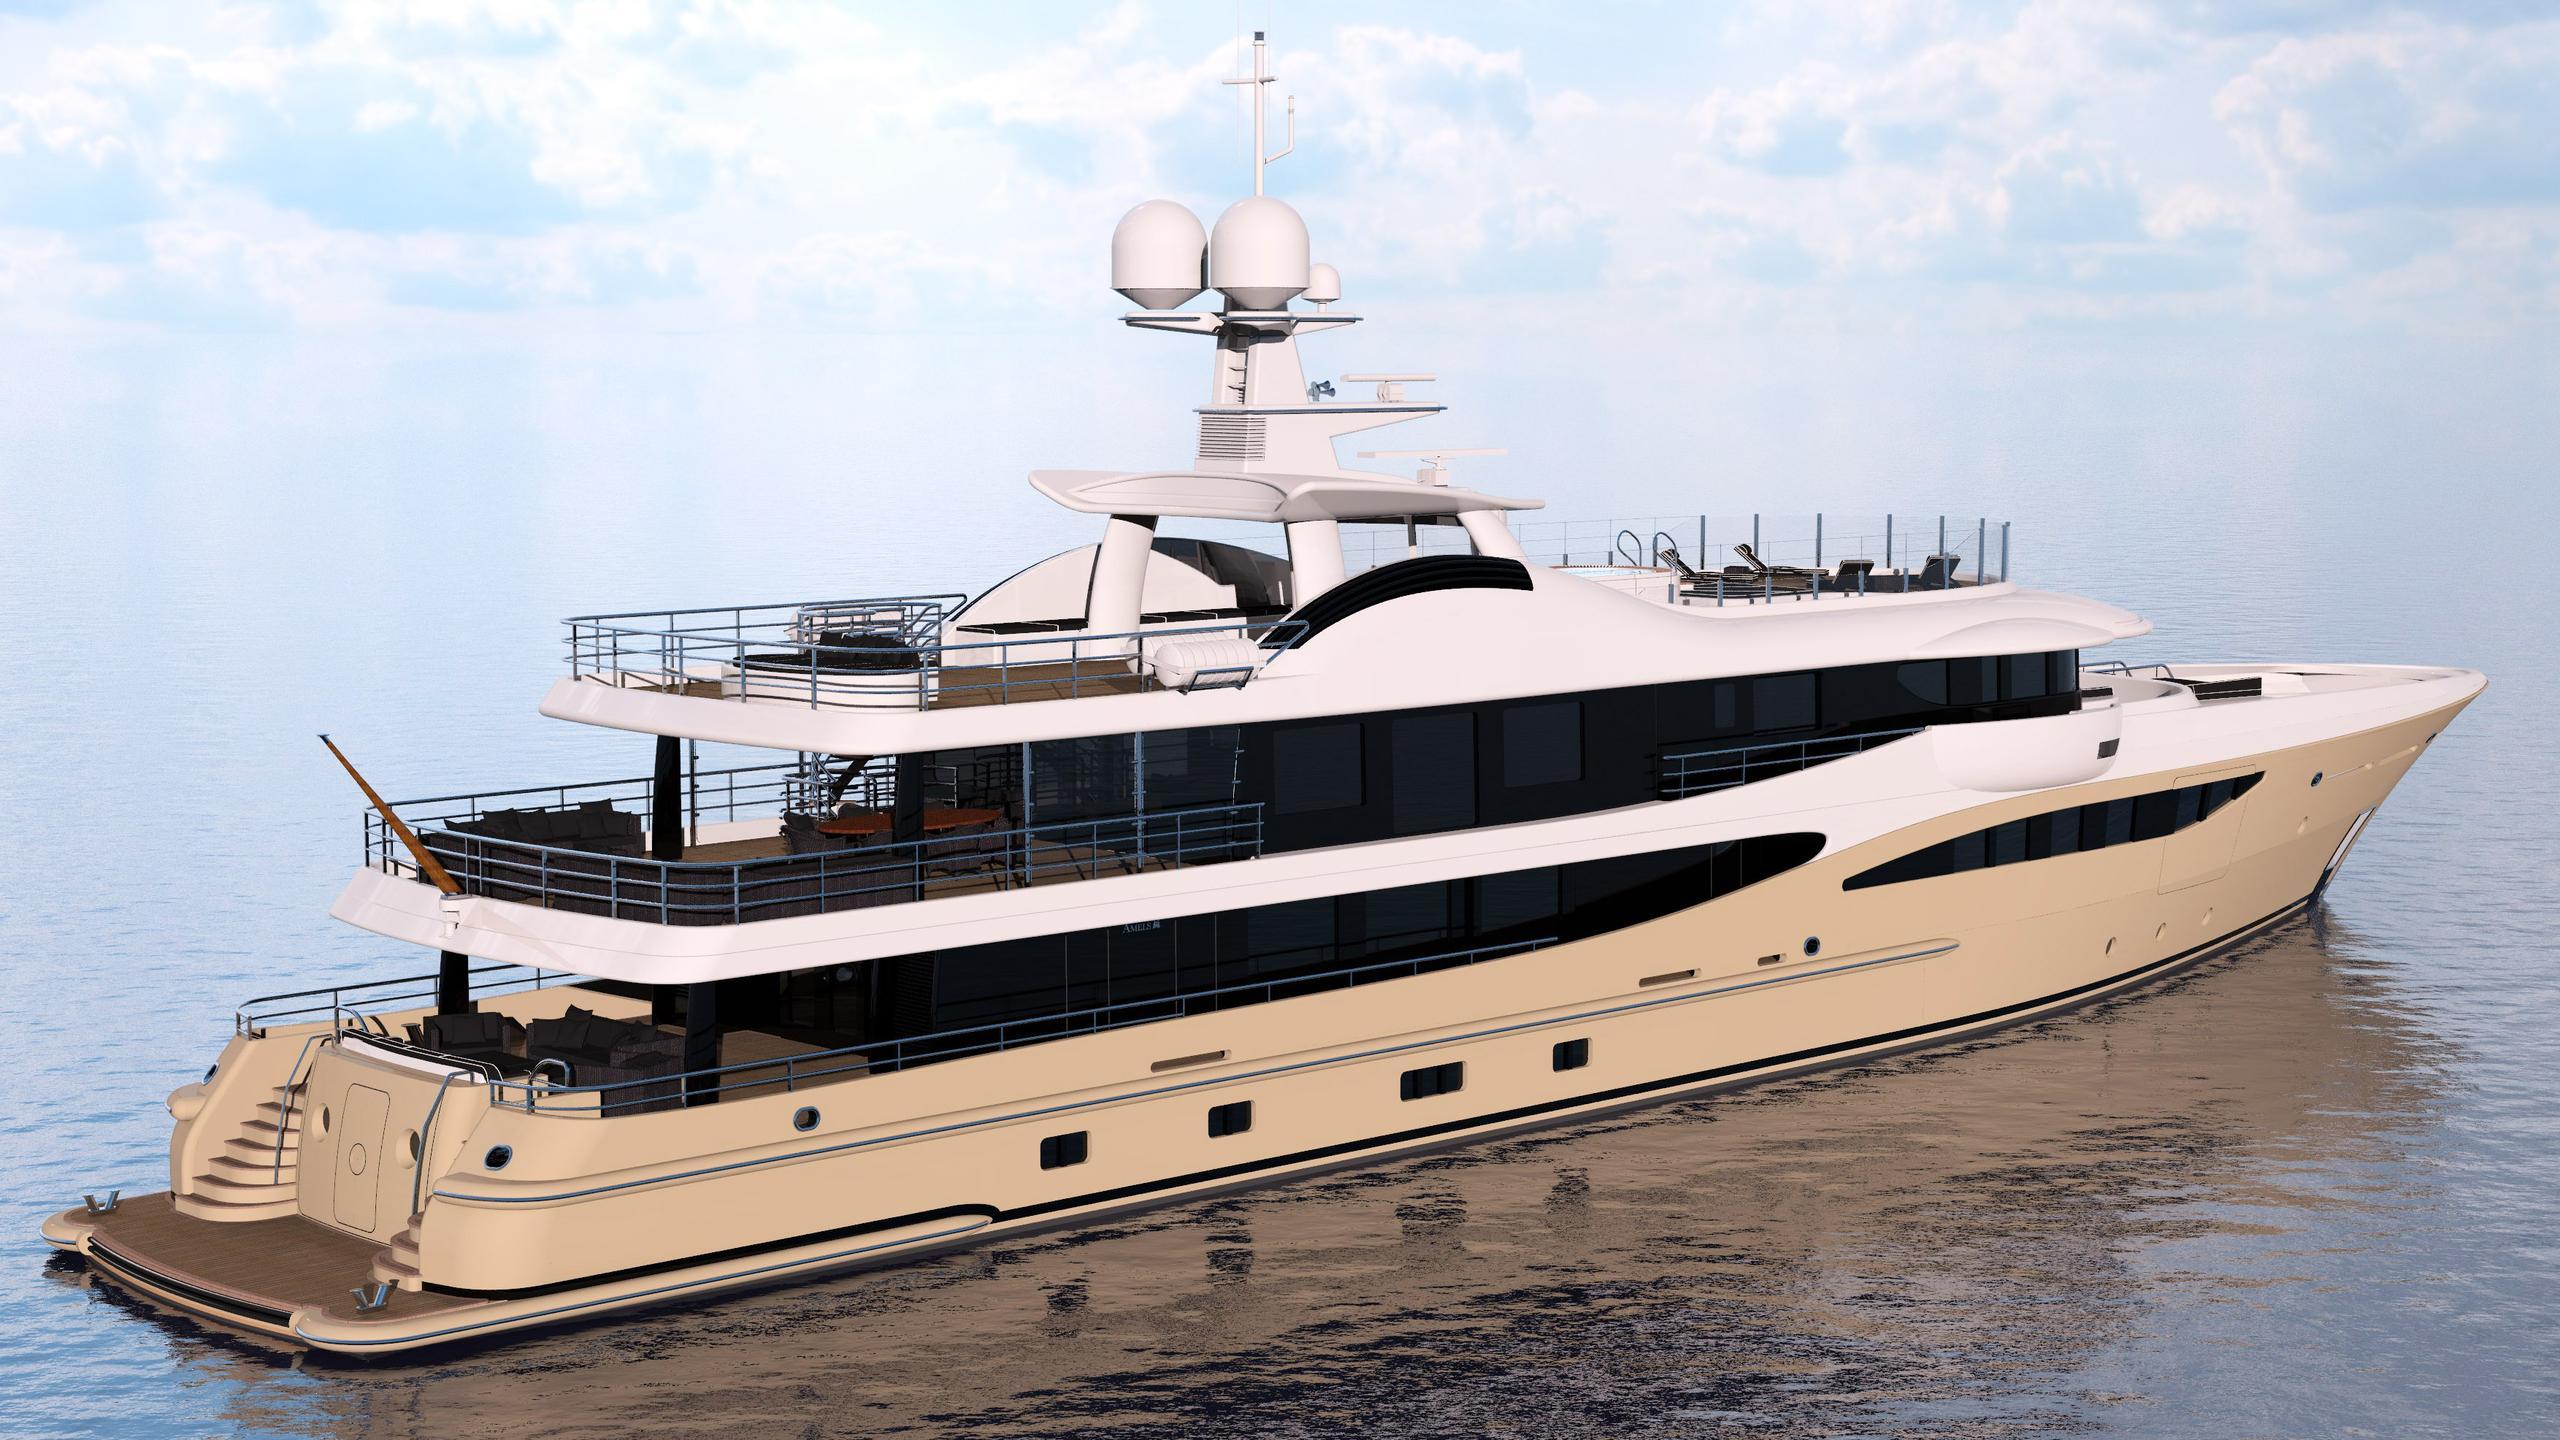 lili motoryacht amels le180 55m 2017 half stern rendering